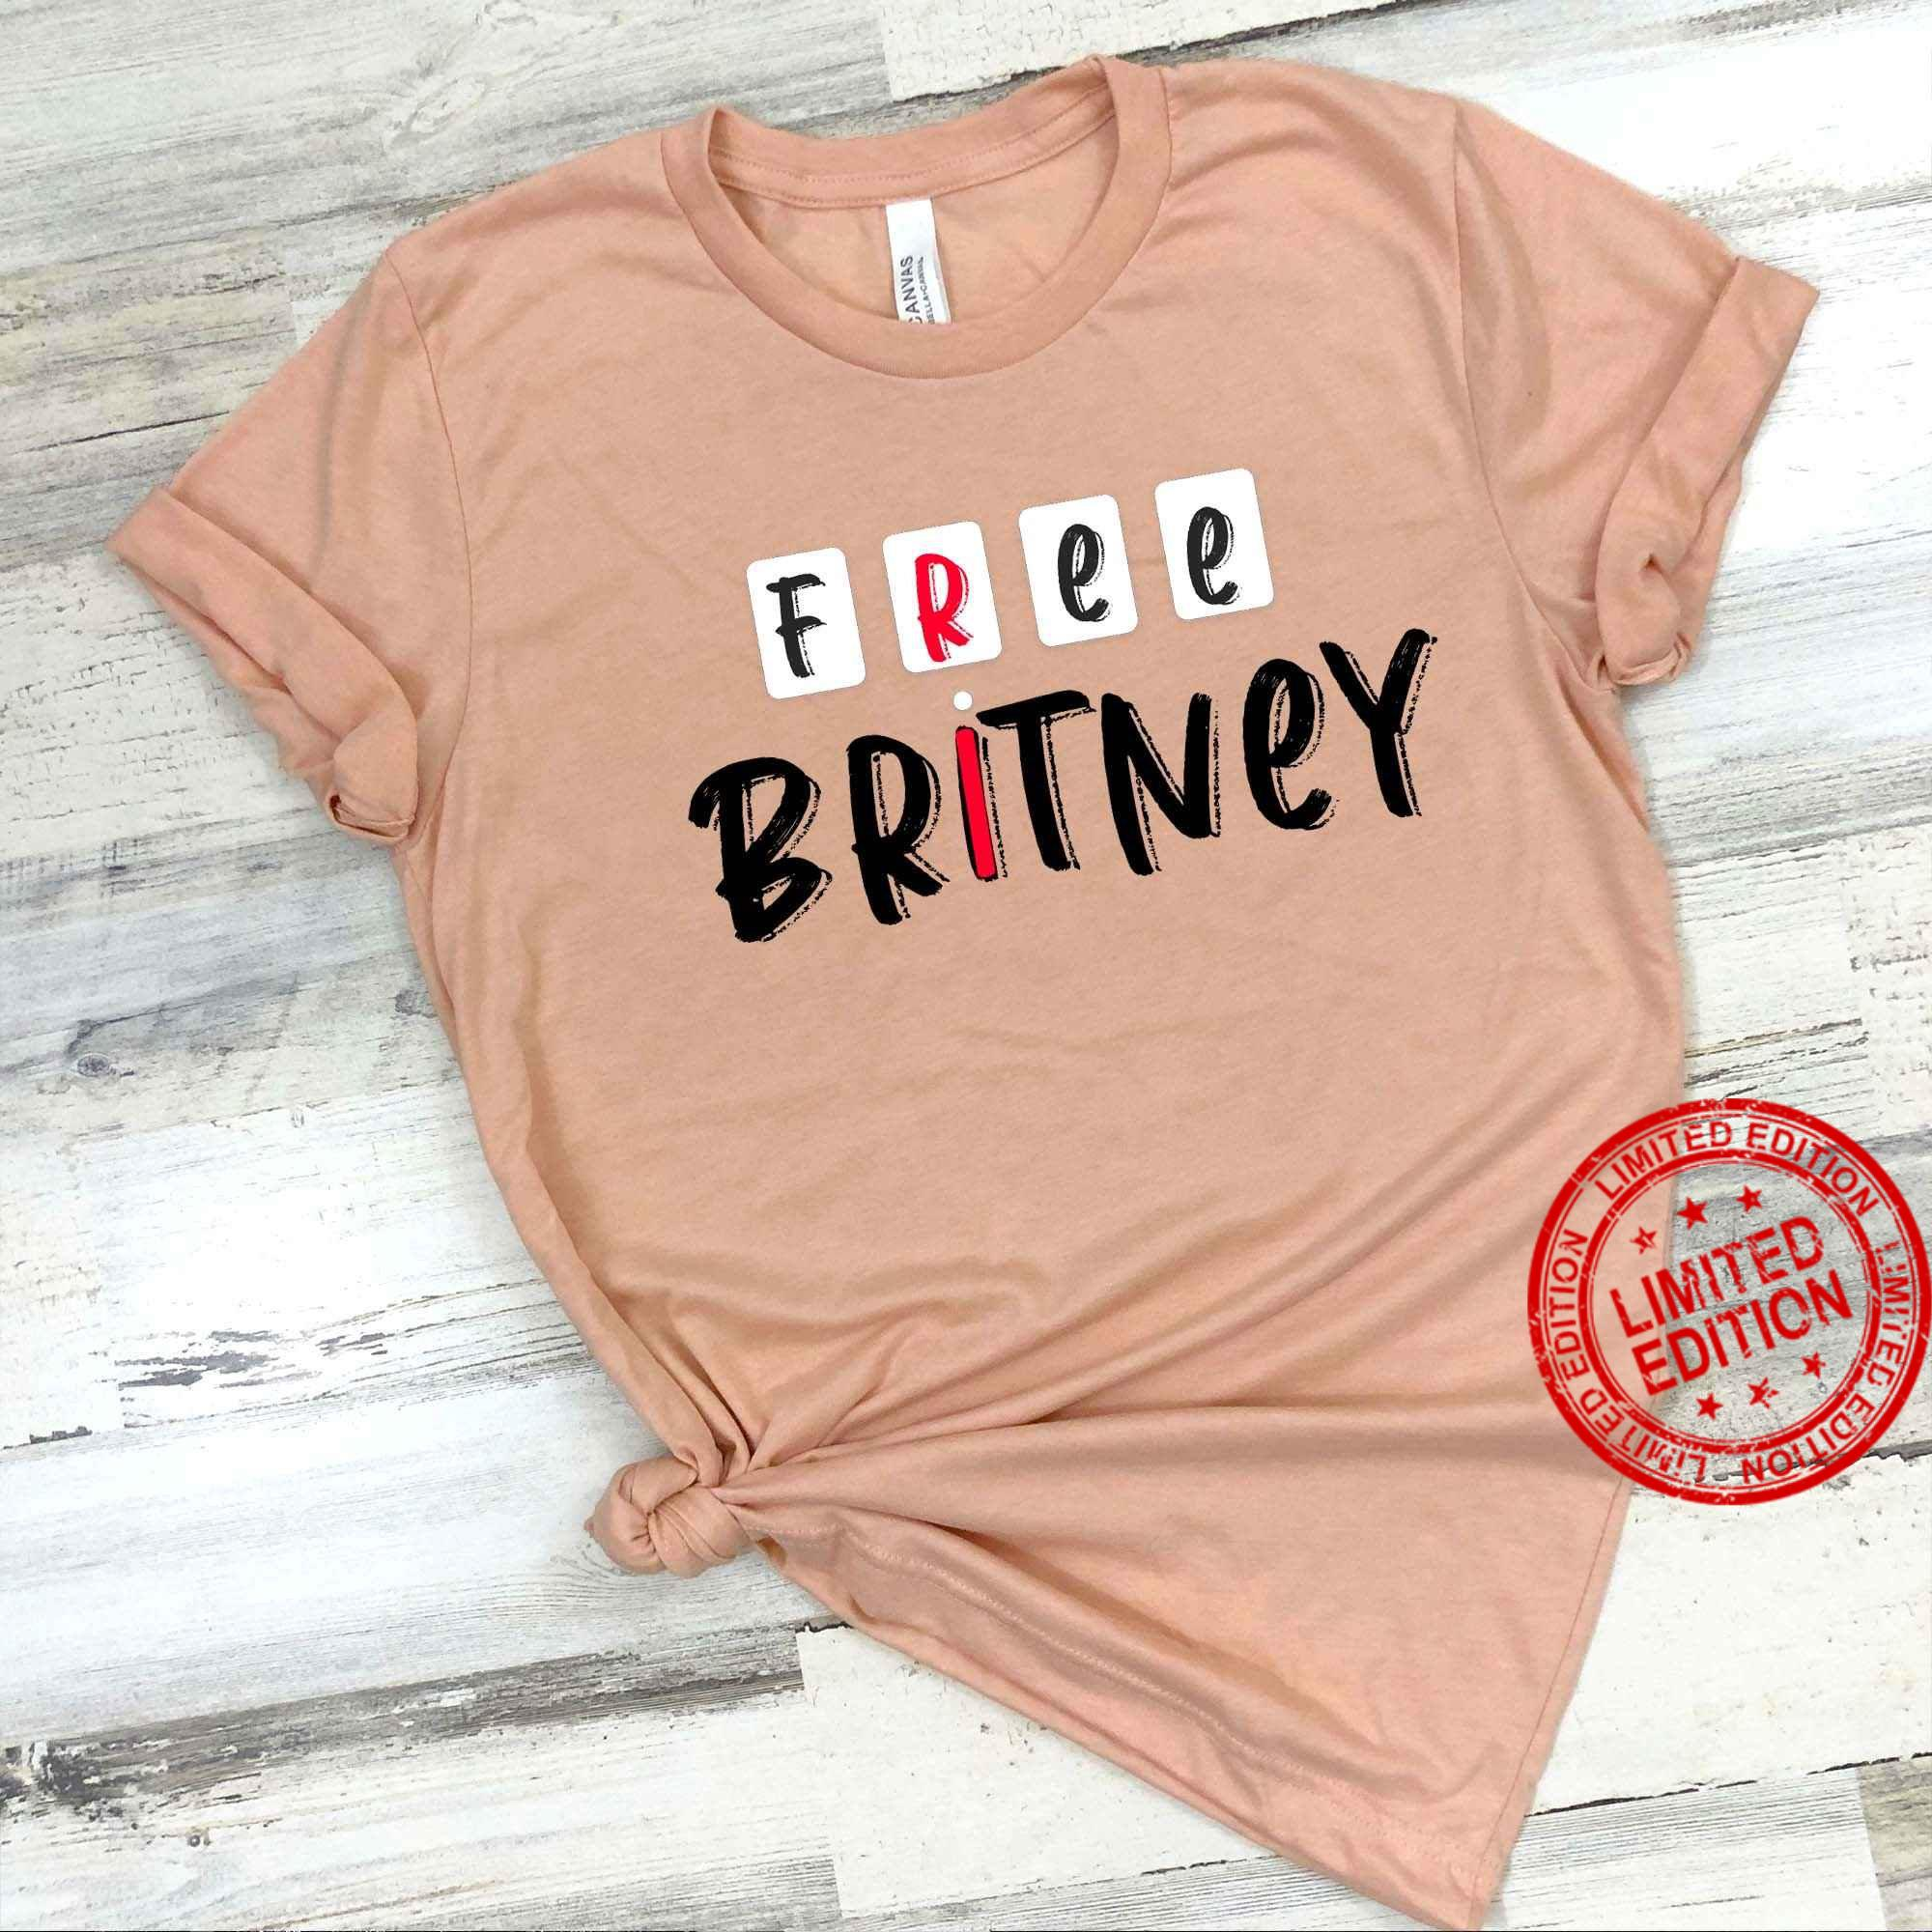 Free Britney Free Britney Shirt